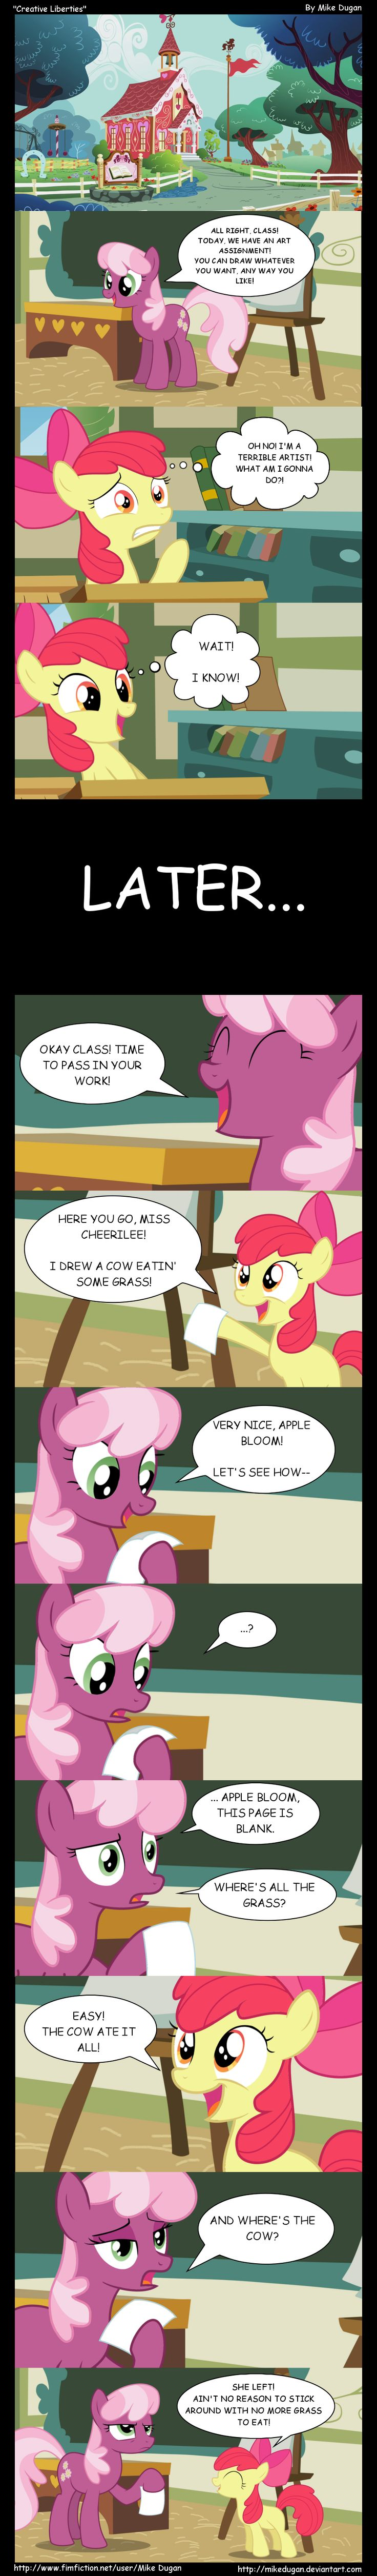 Oh Applebloom